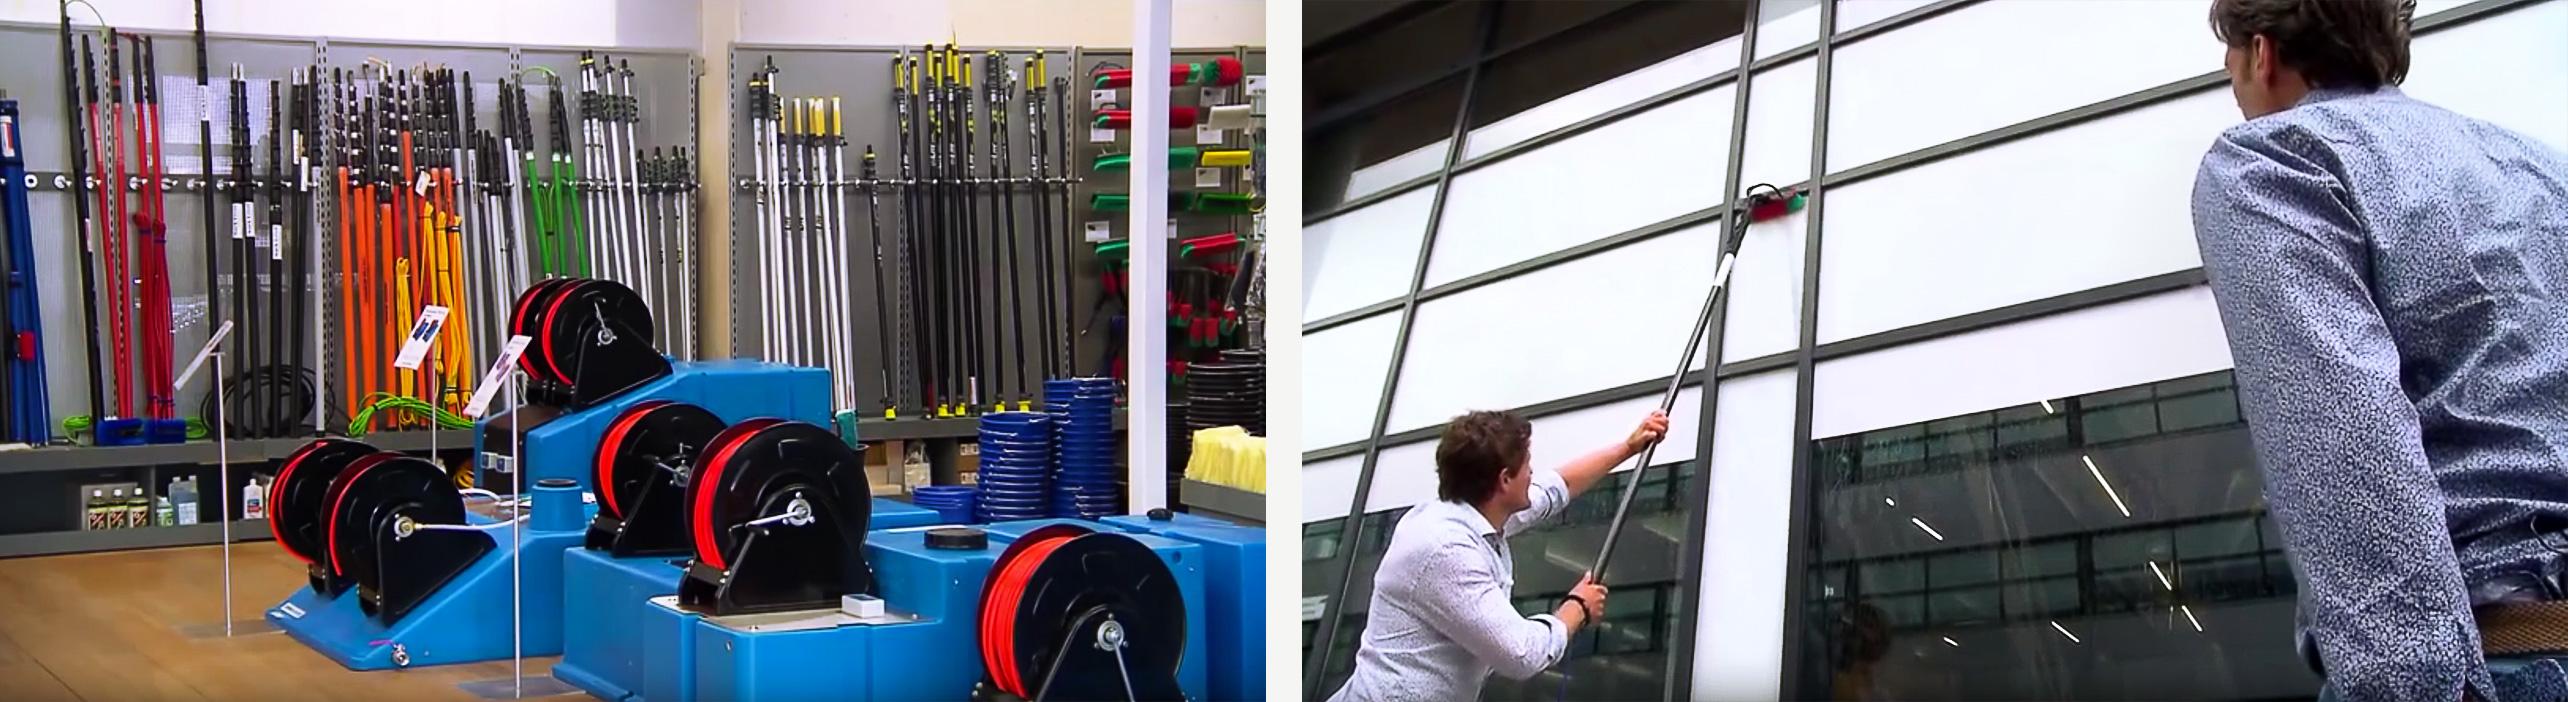 osmoworks glazenwasserswinkel glazenwasser telescoop glasbewassing